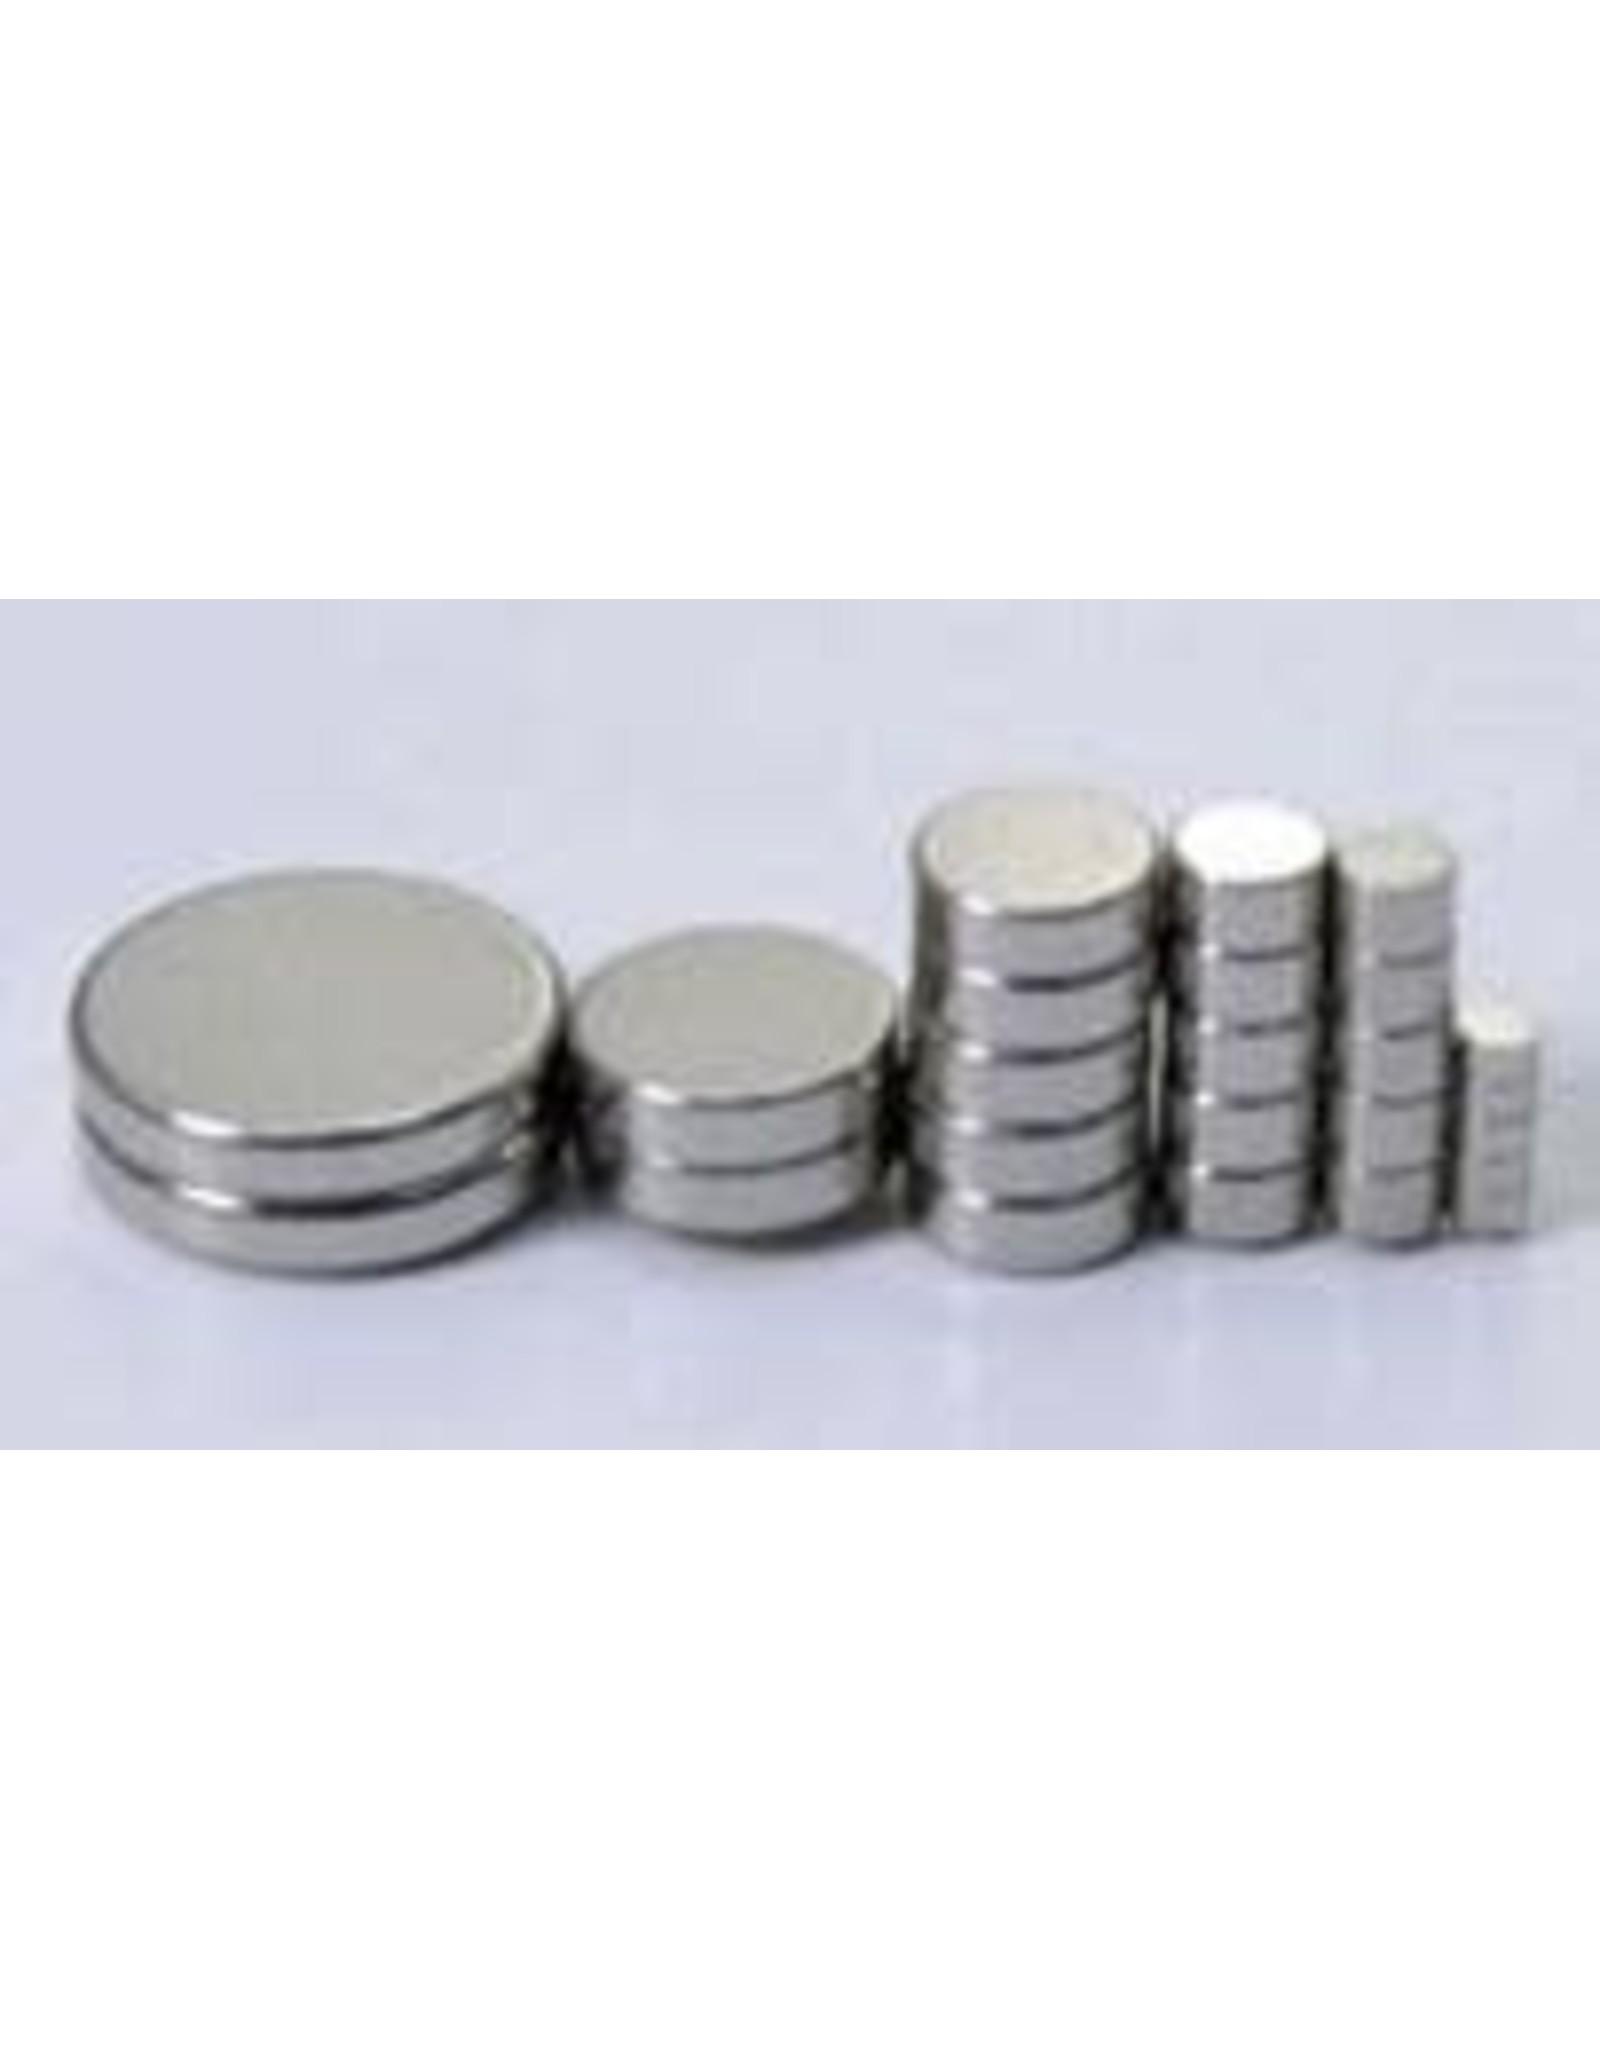 Primal Horizon Magnets: Variety Pack (24)